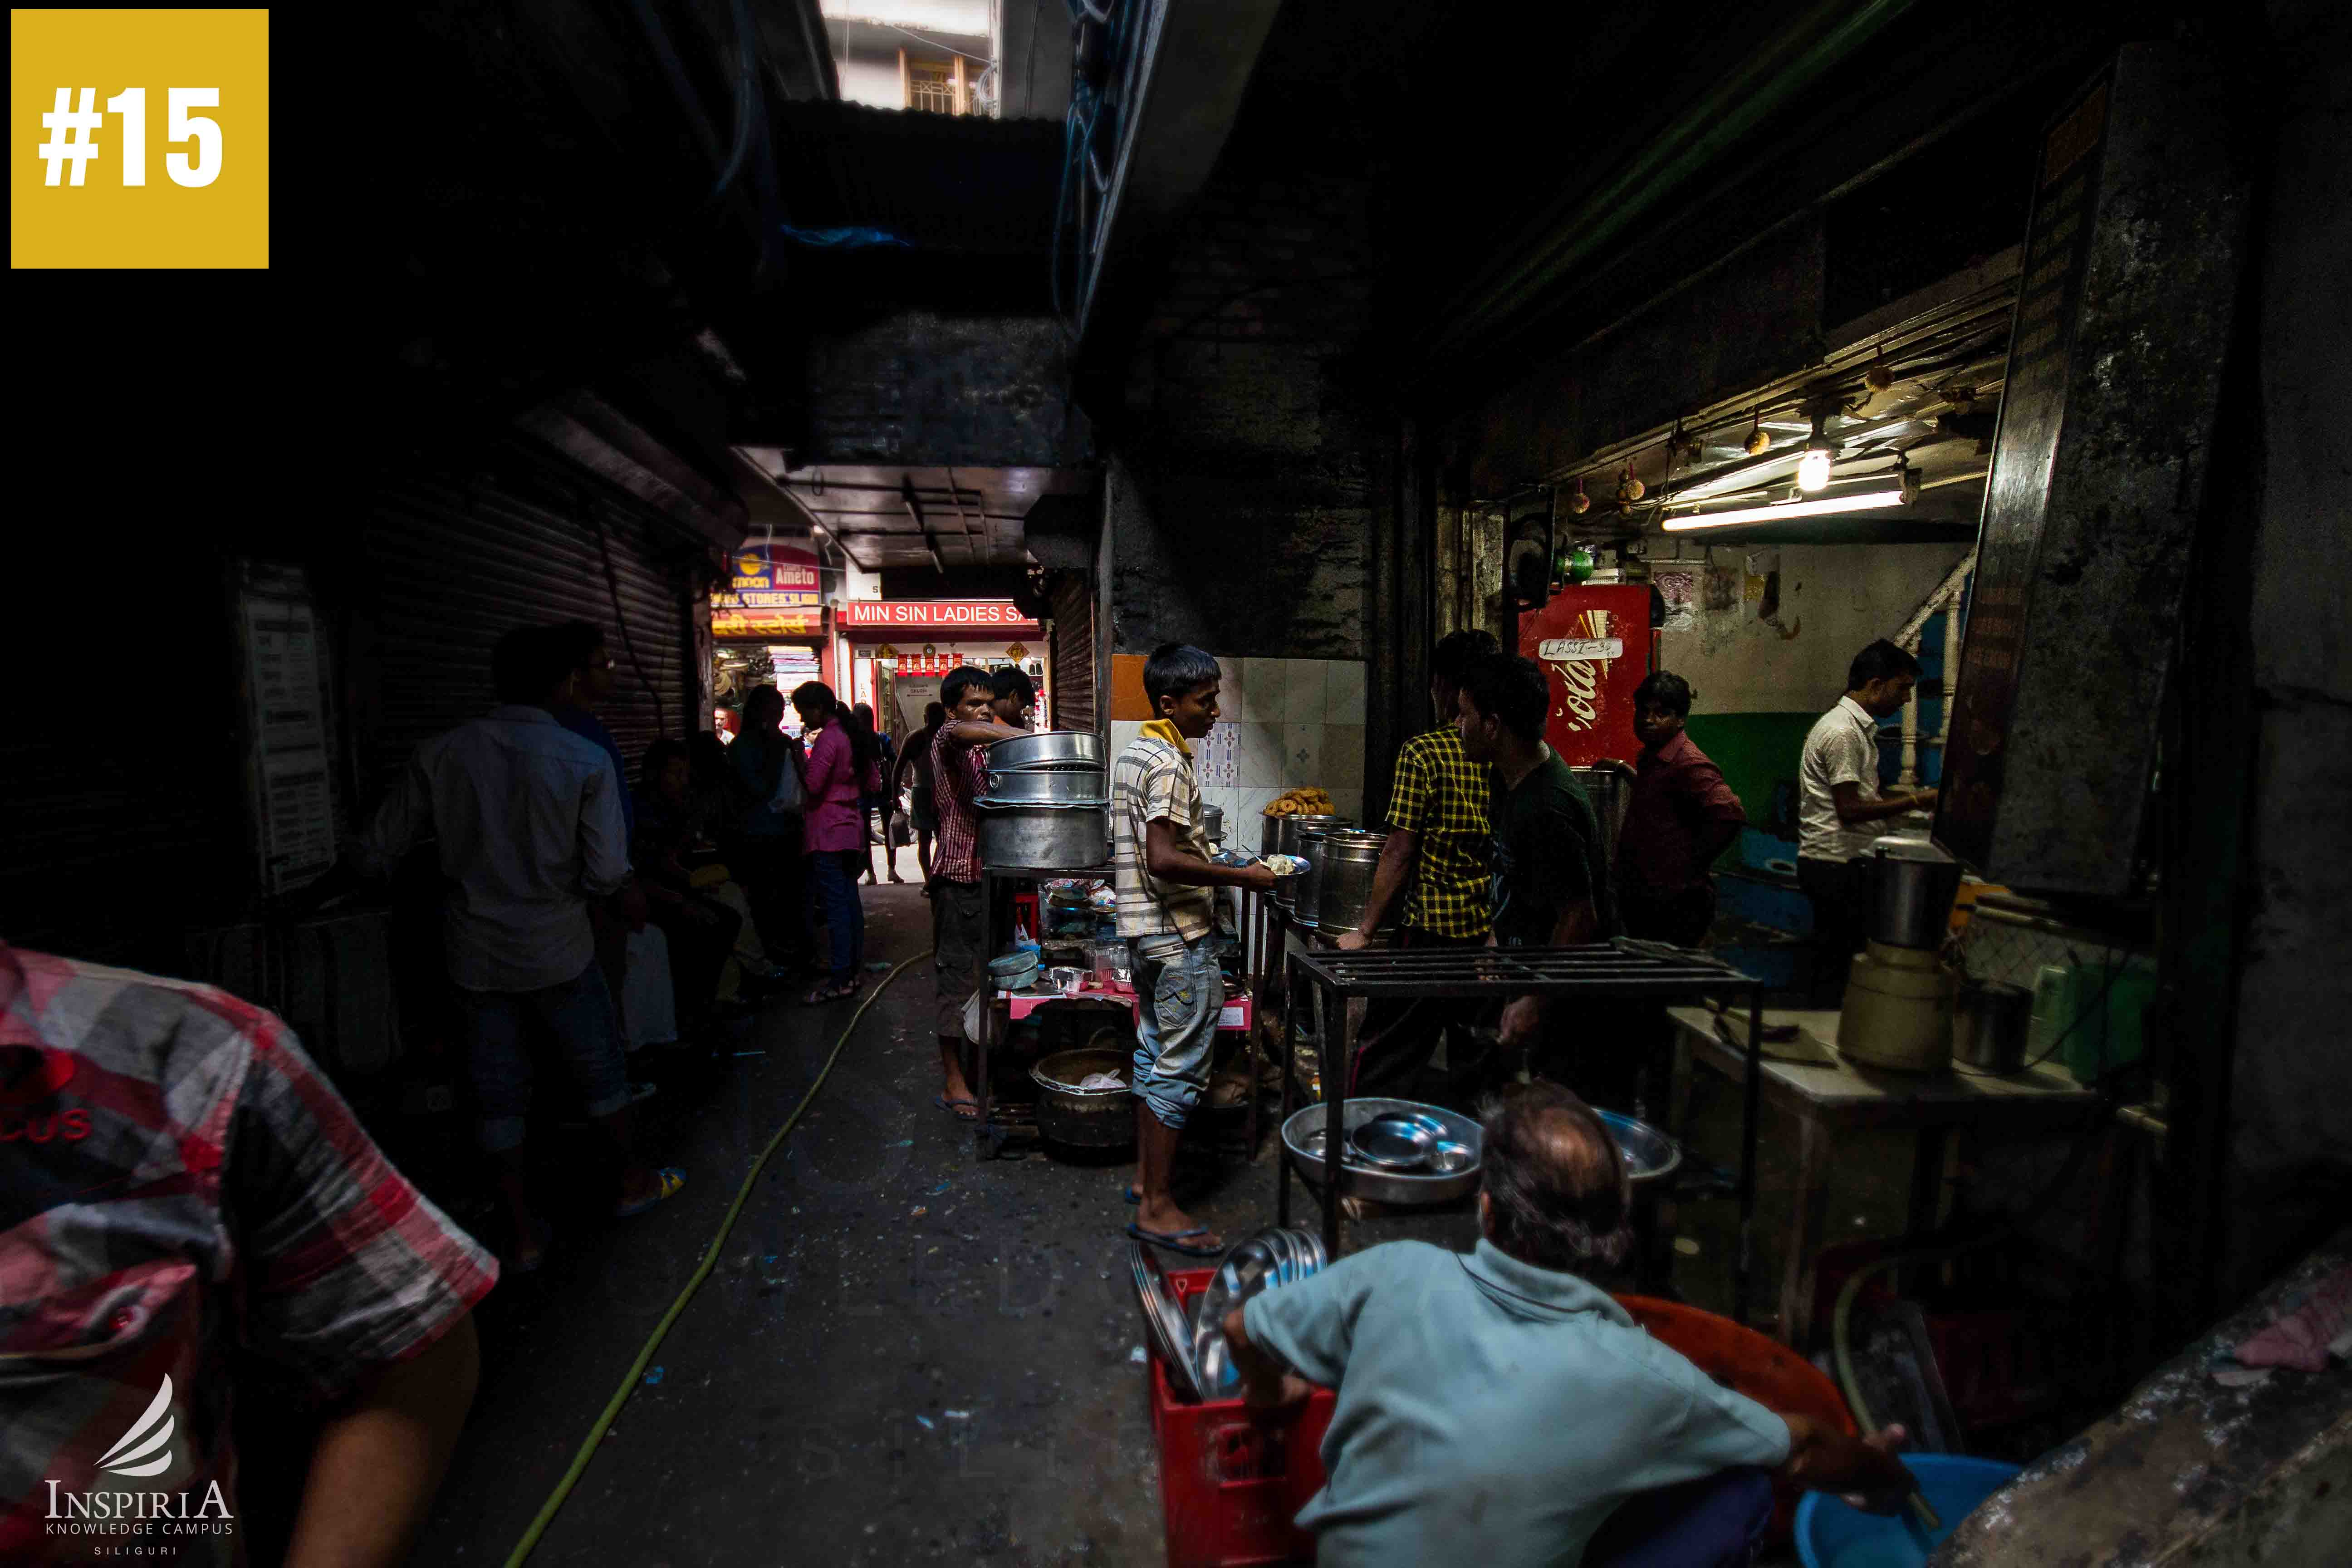 Hong-kong-market-siliguri-momo-market-momo-lane